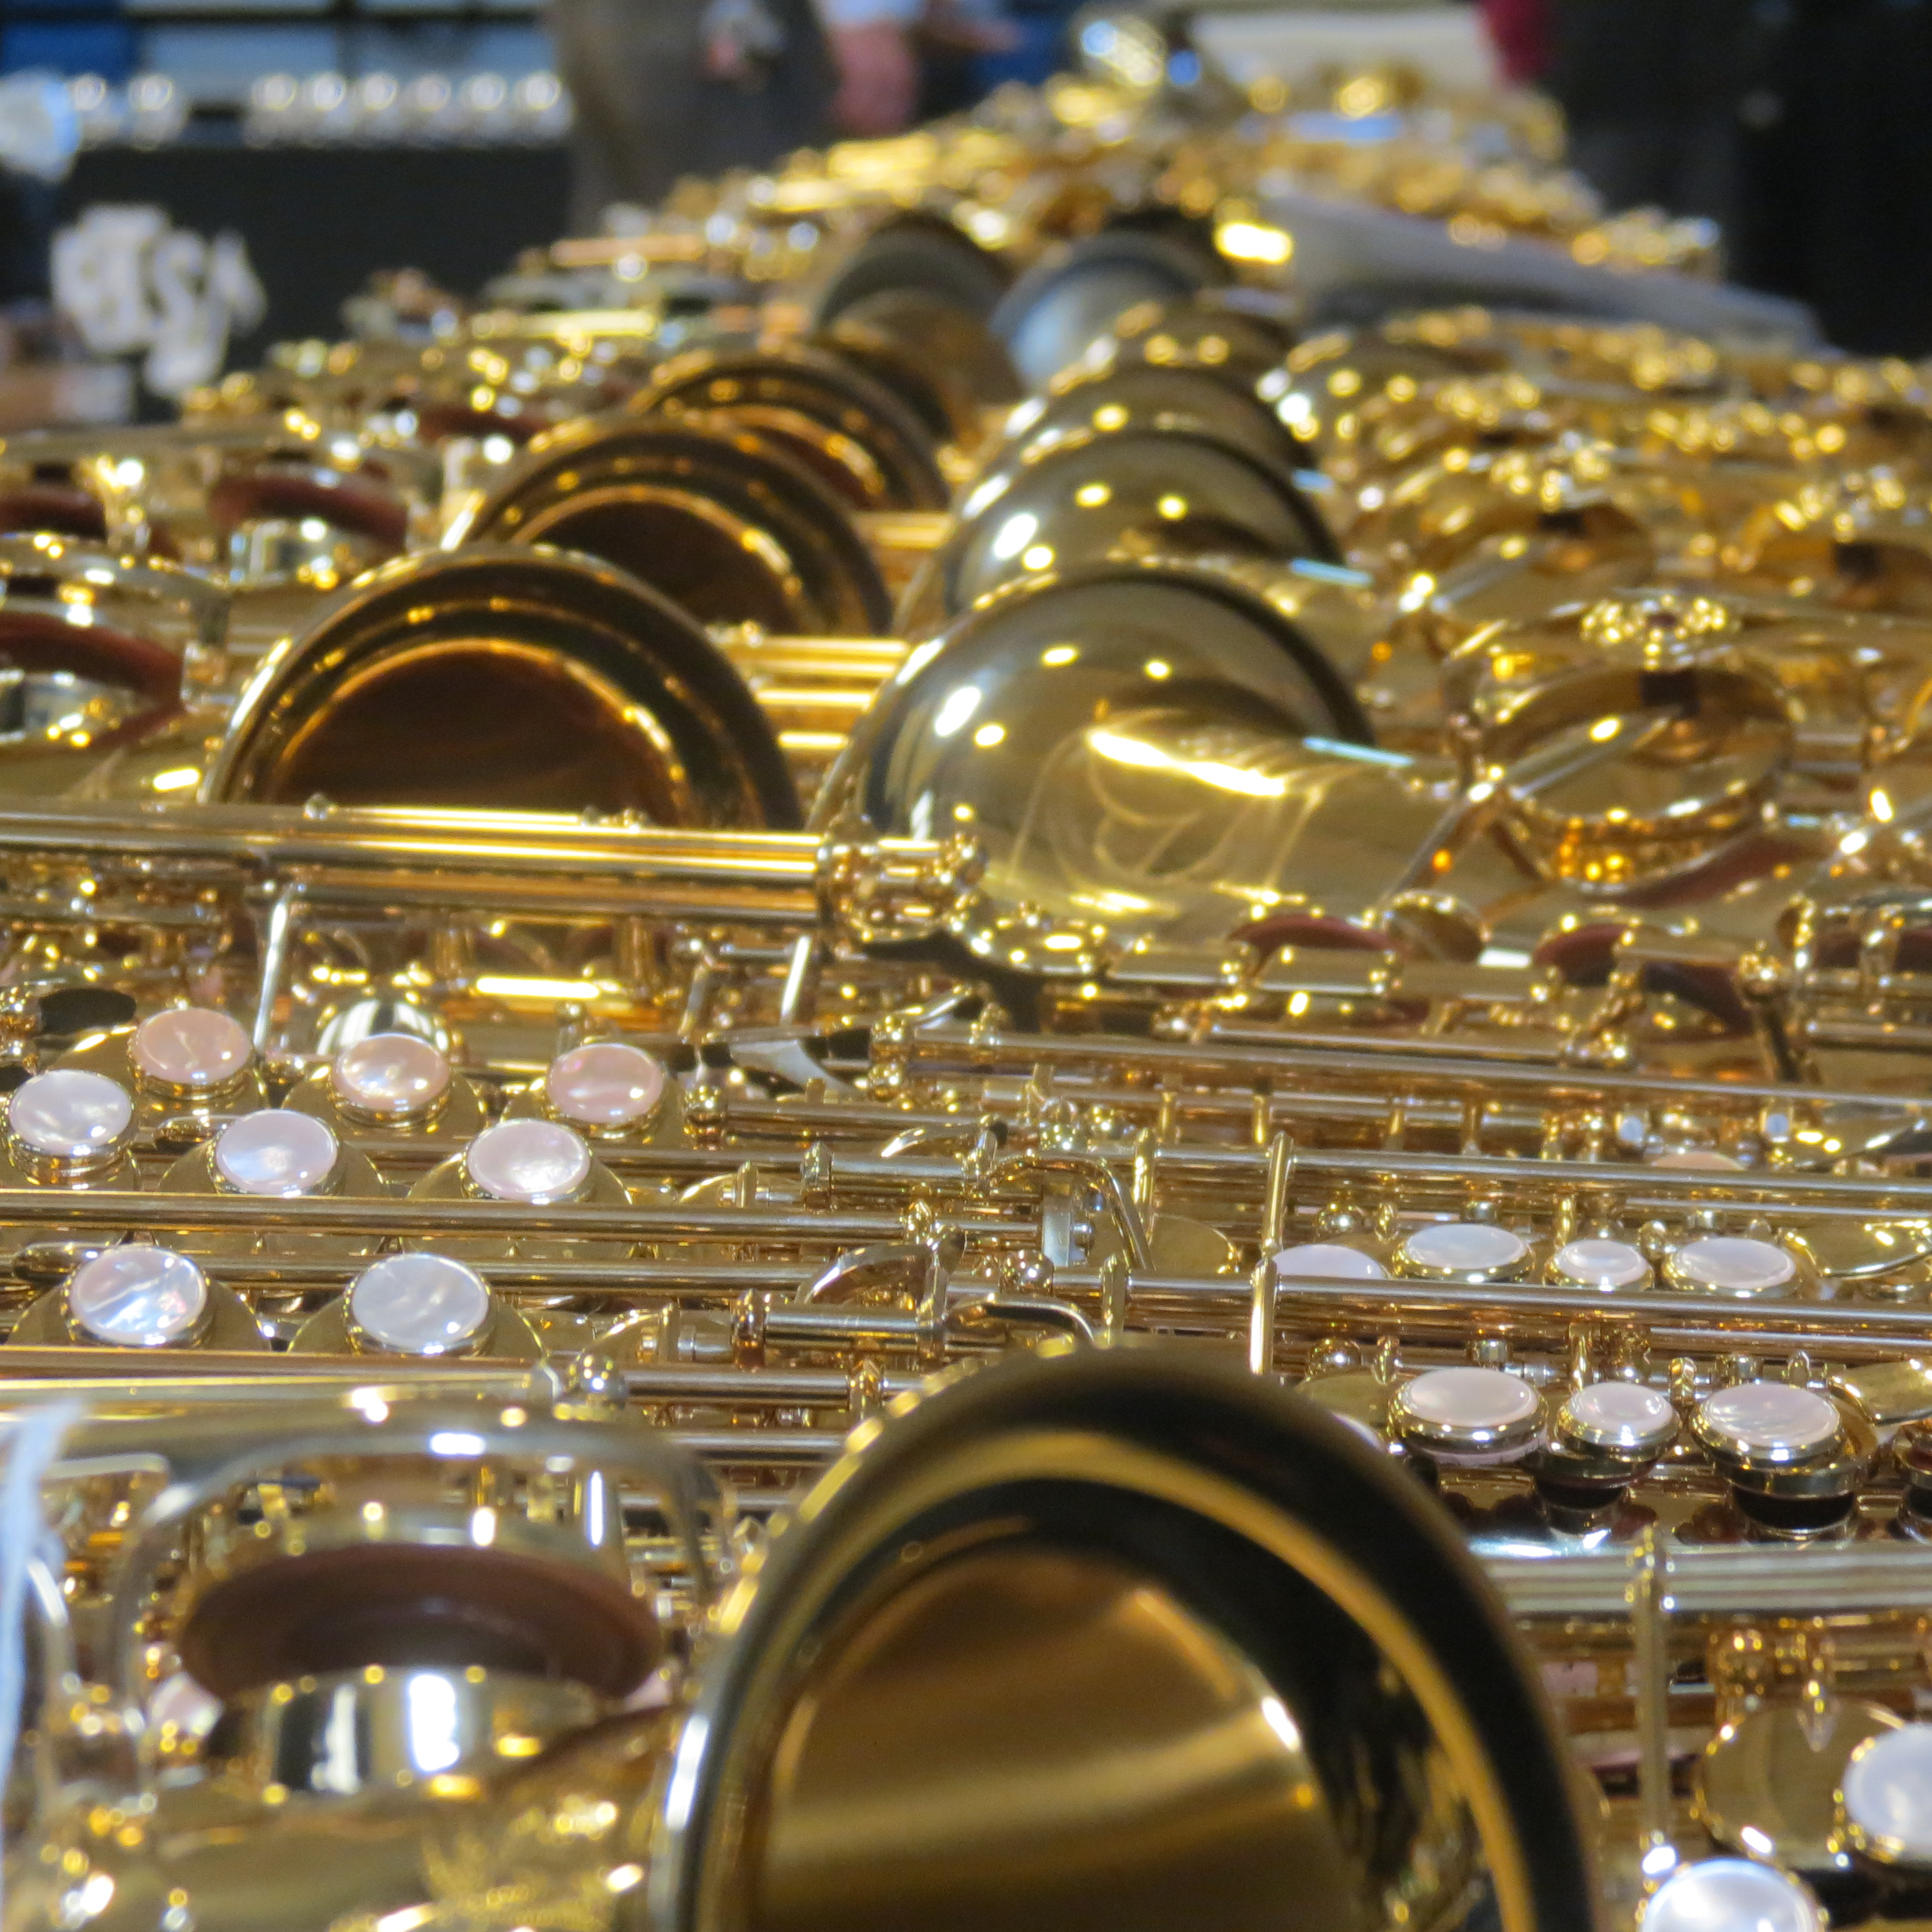 Music Amp Arts Announces Upgrade Your Sound Event Line Up